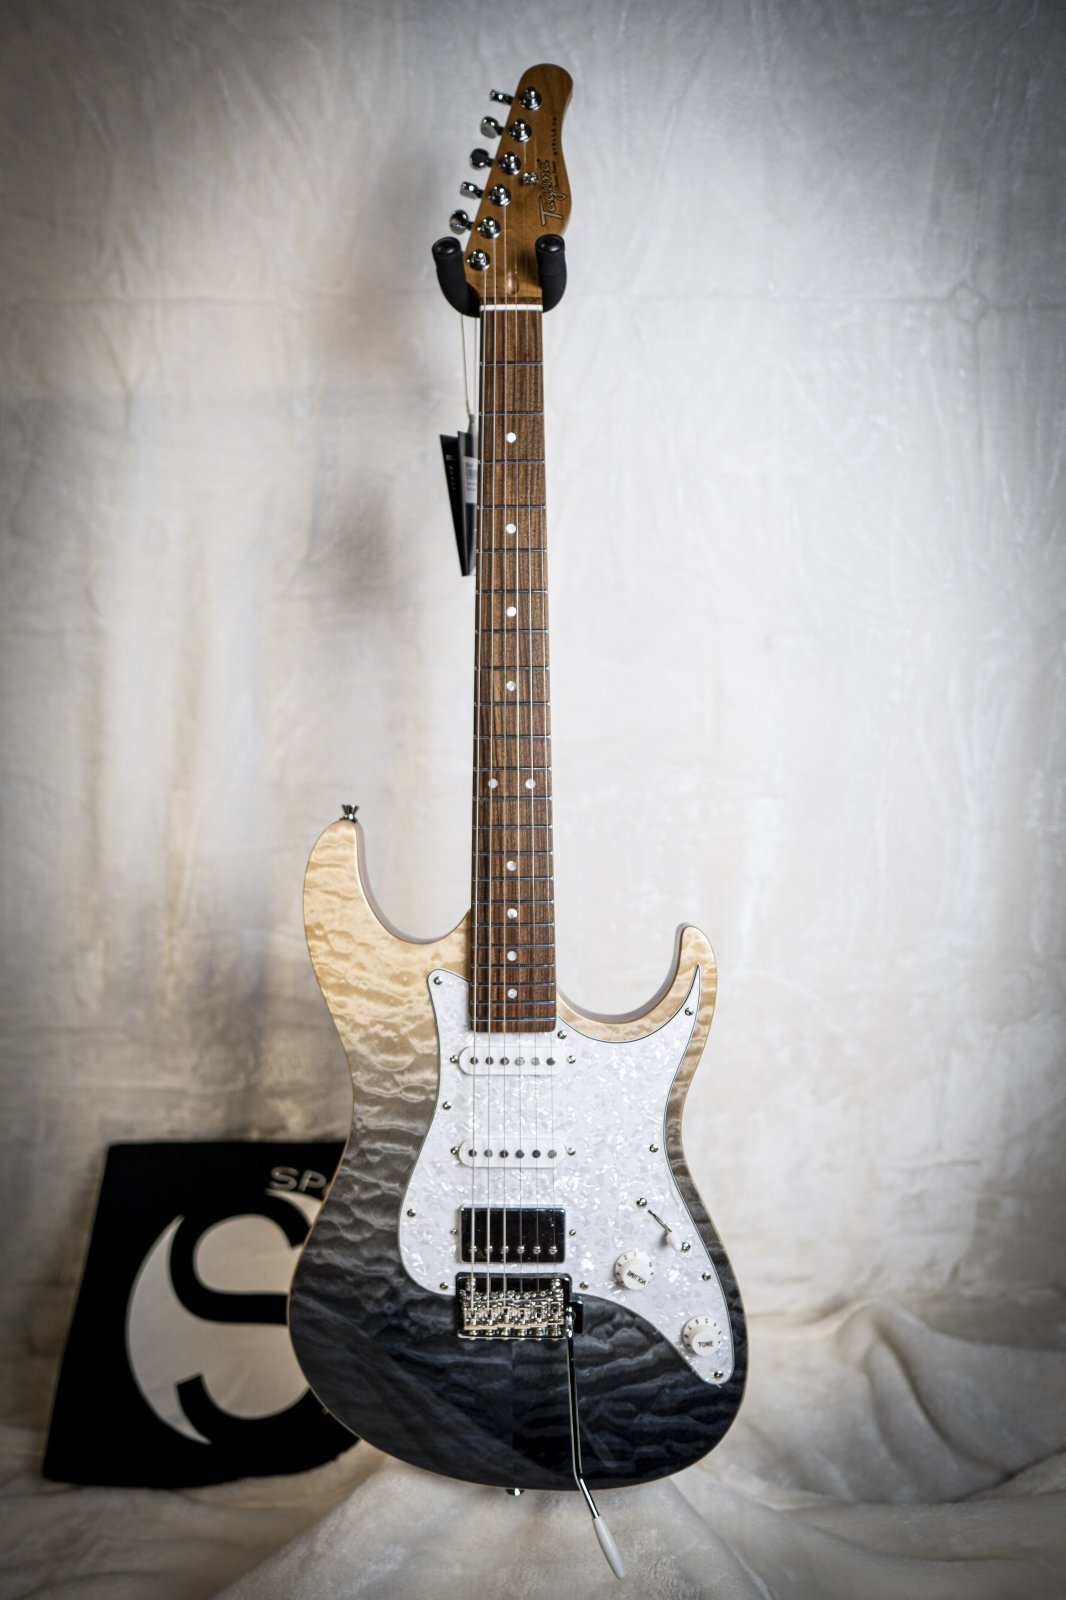 Tagima Stella DW-TBKF-DF/PW Transparent Gray/Black Fade Electric Guitar